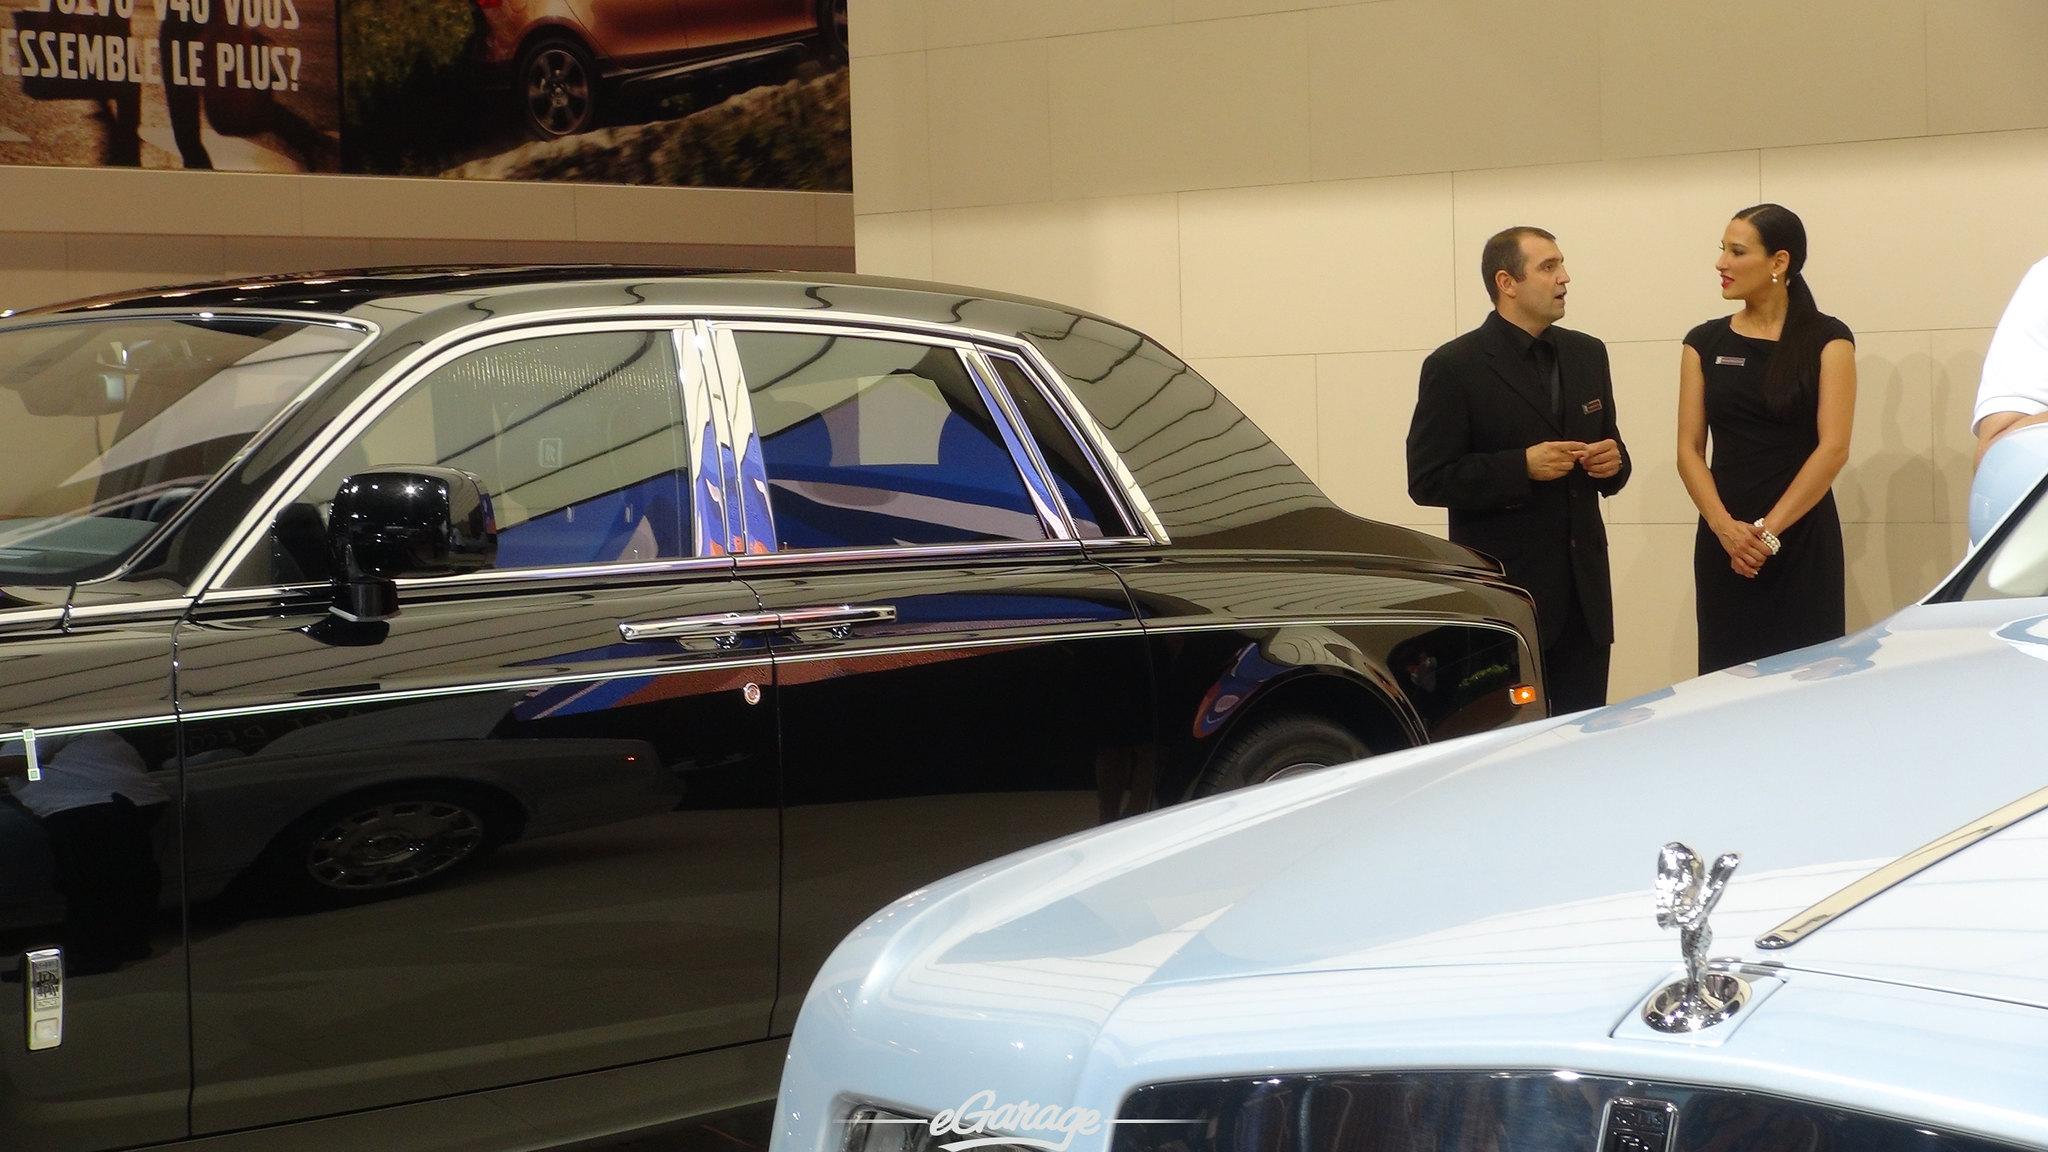 8037665249 fd5271ad1b k 2012 Paris Motor Show